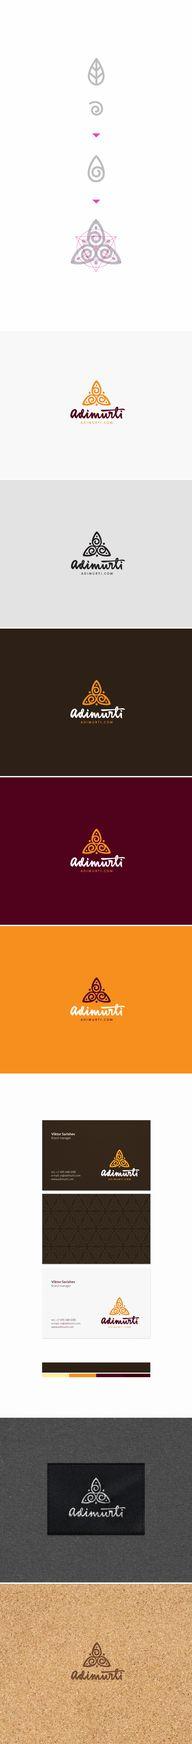 Adimurti on the Beha